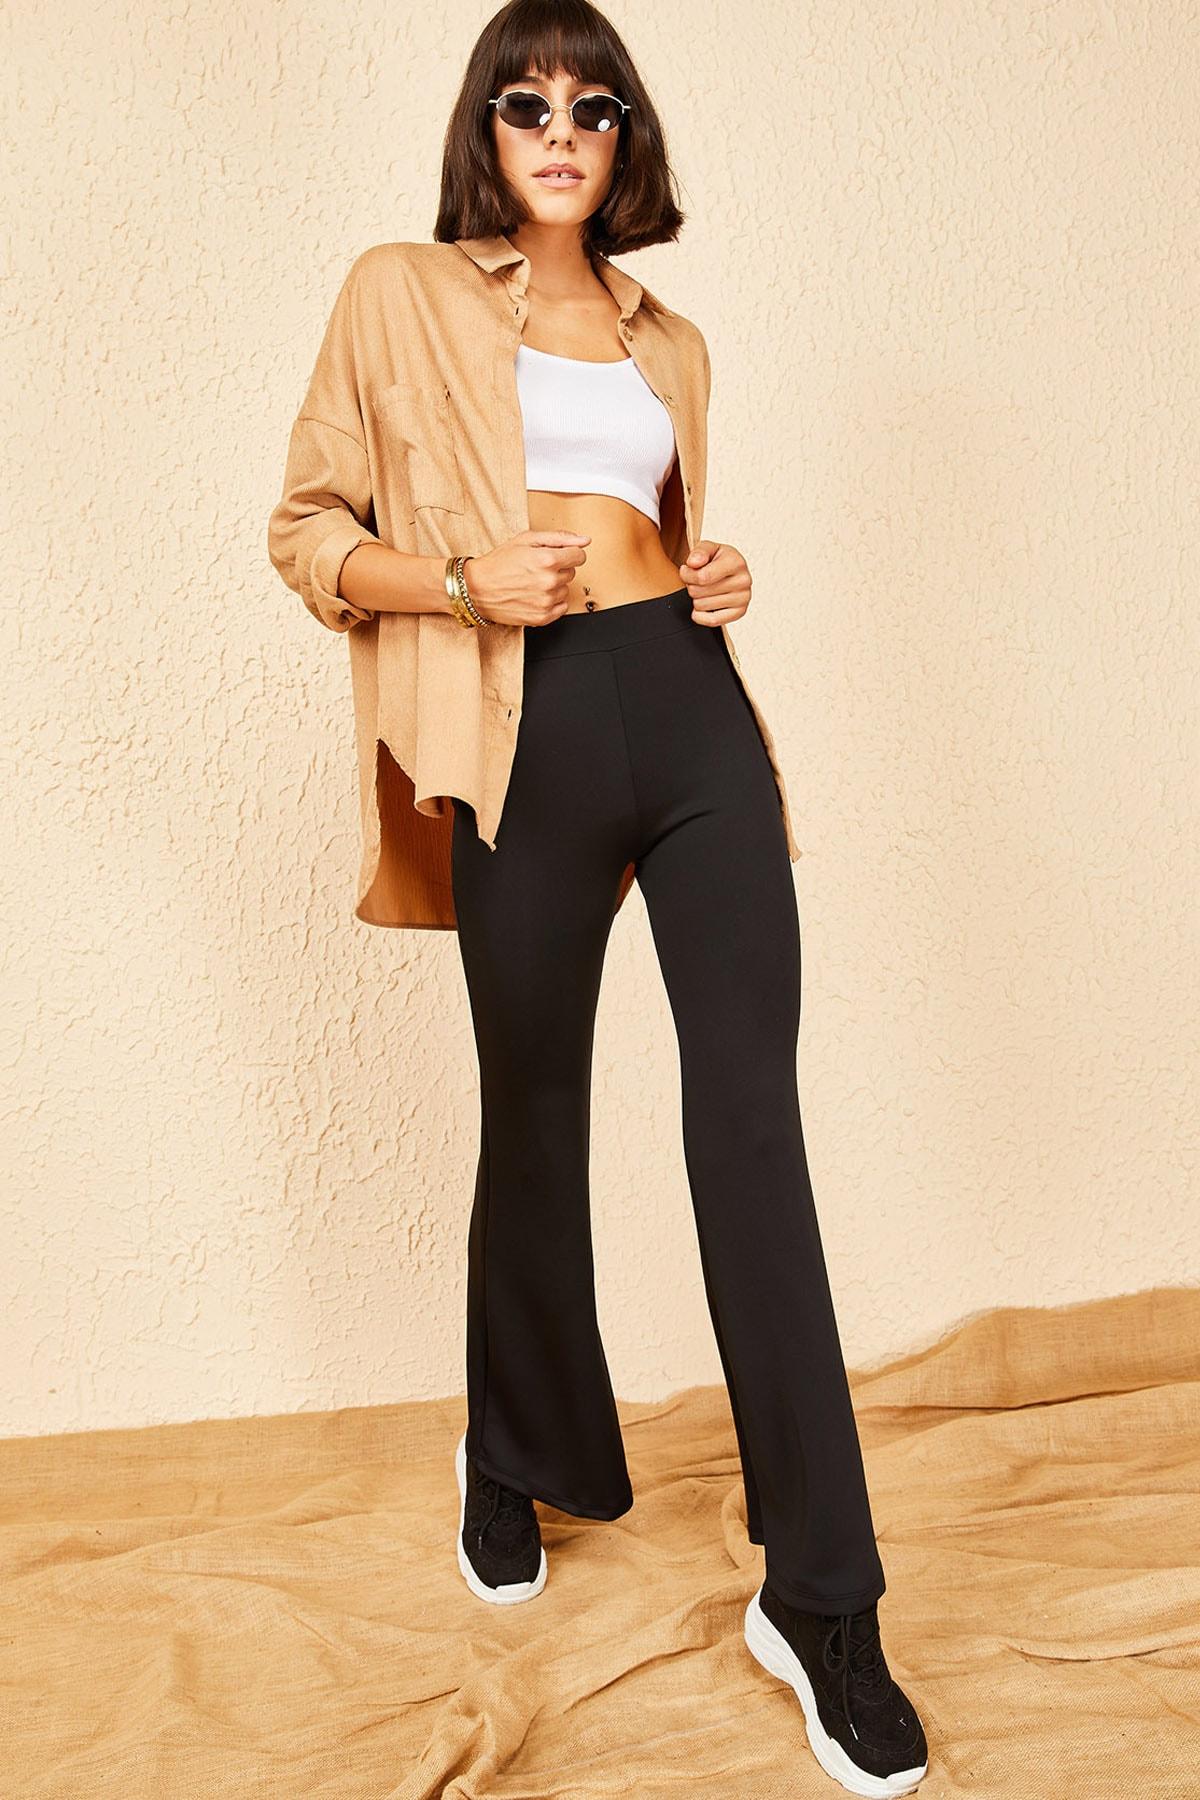 Bianco Lucci Kadın Siyah Dalgıç Kumaş Ispanyol Paça Beli Lastikli Pantolon 2